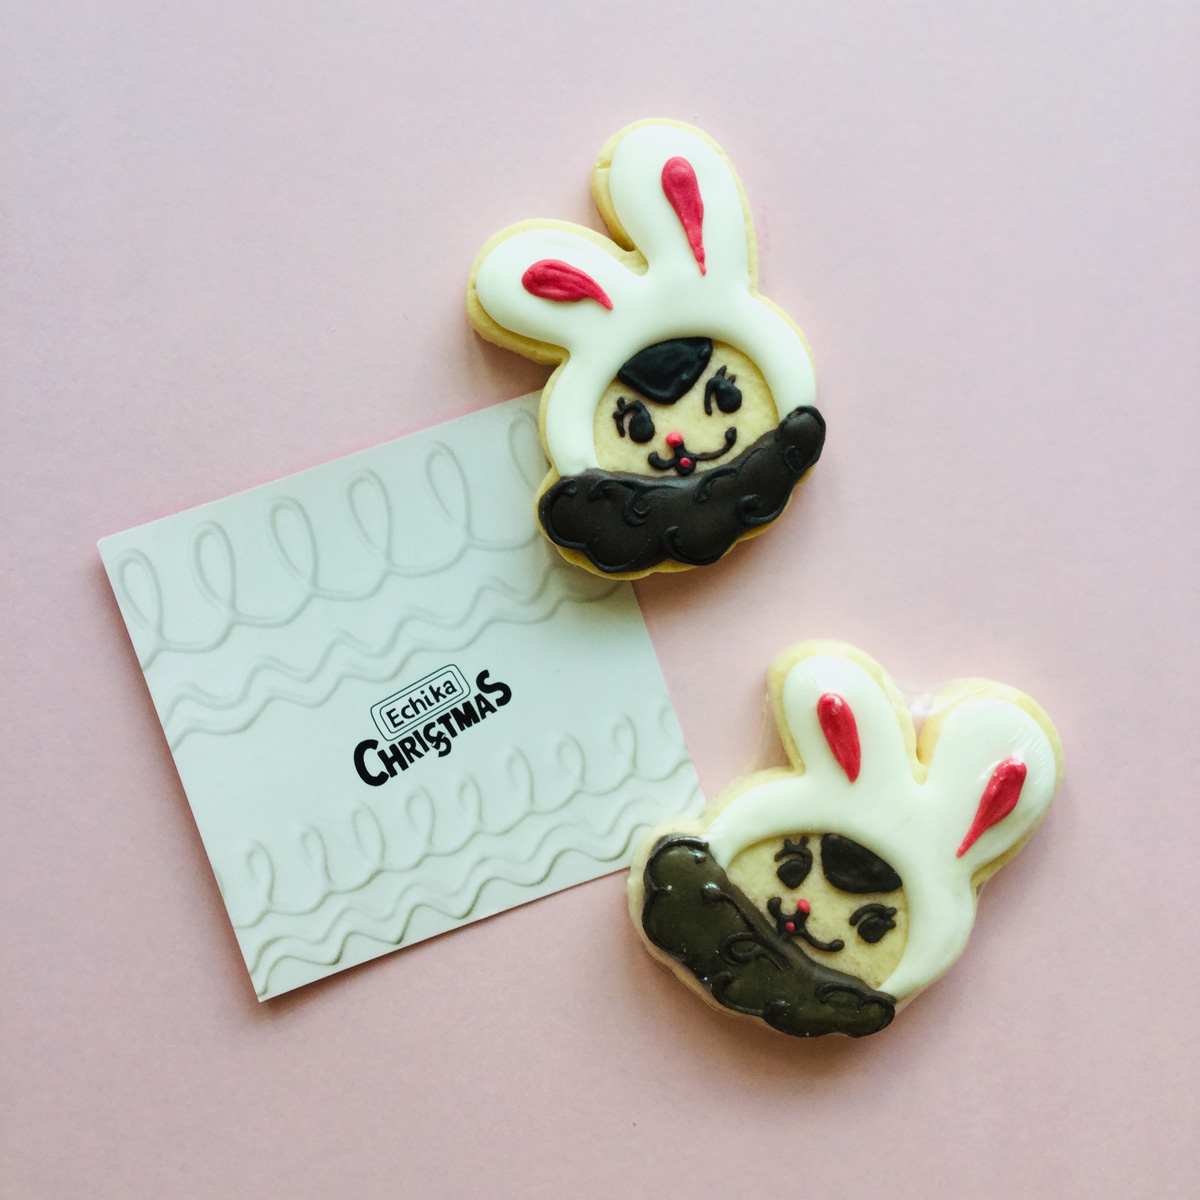 「Echica」クリスマス イベントクッキー